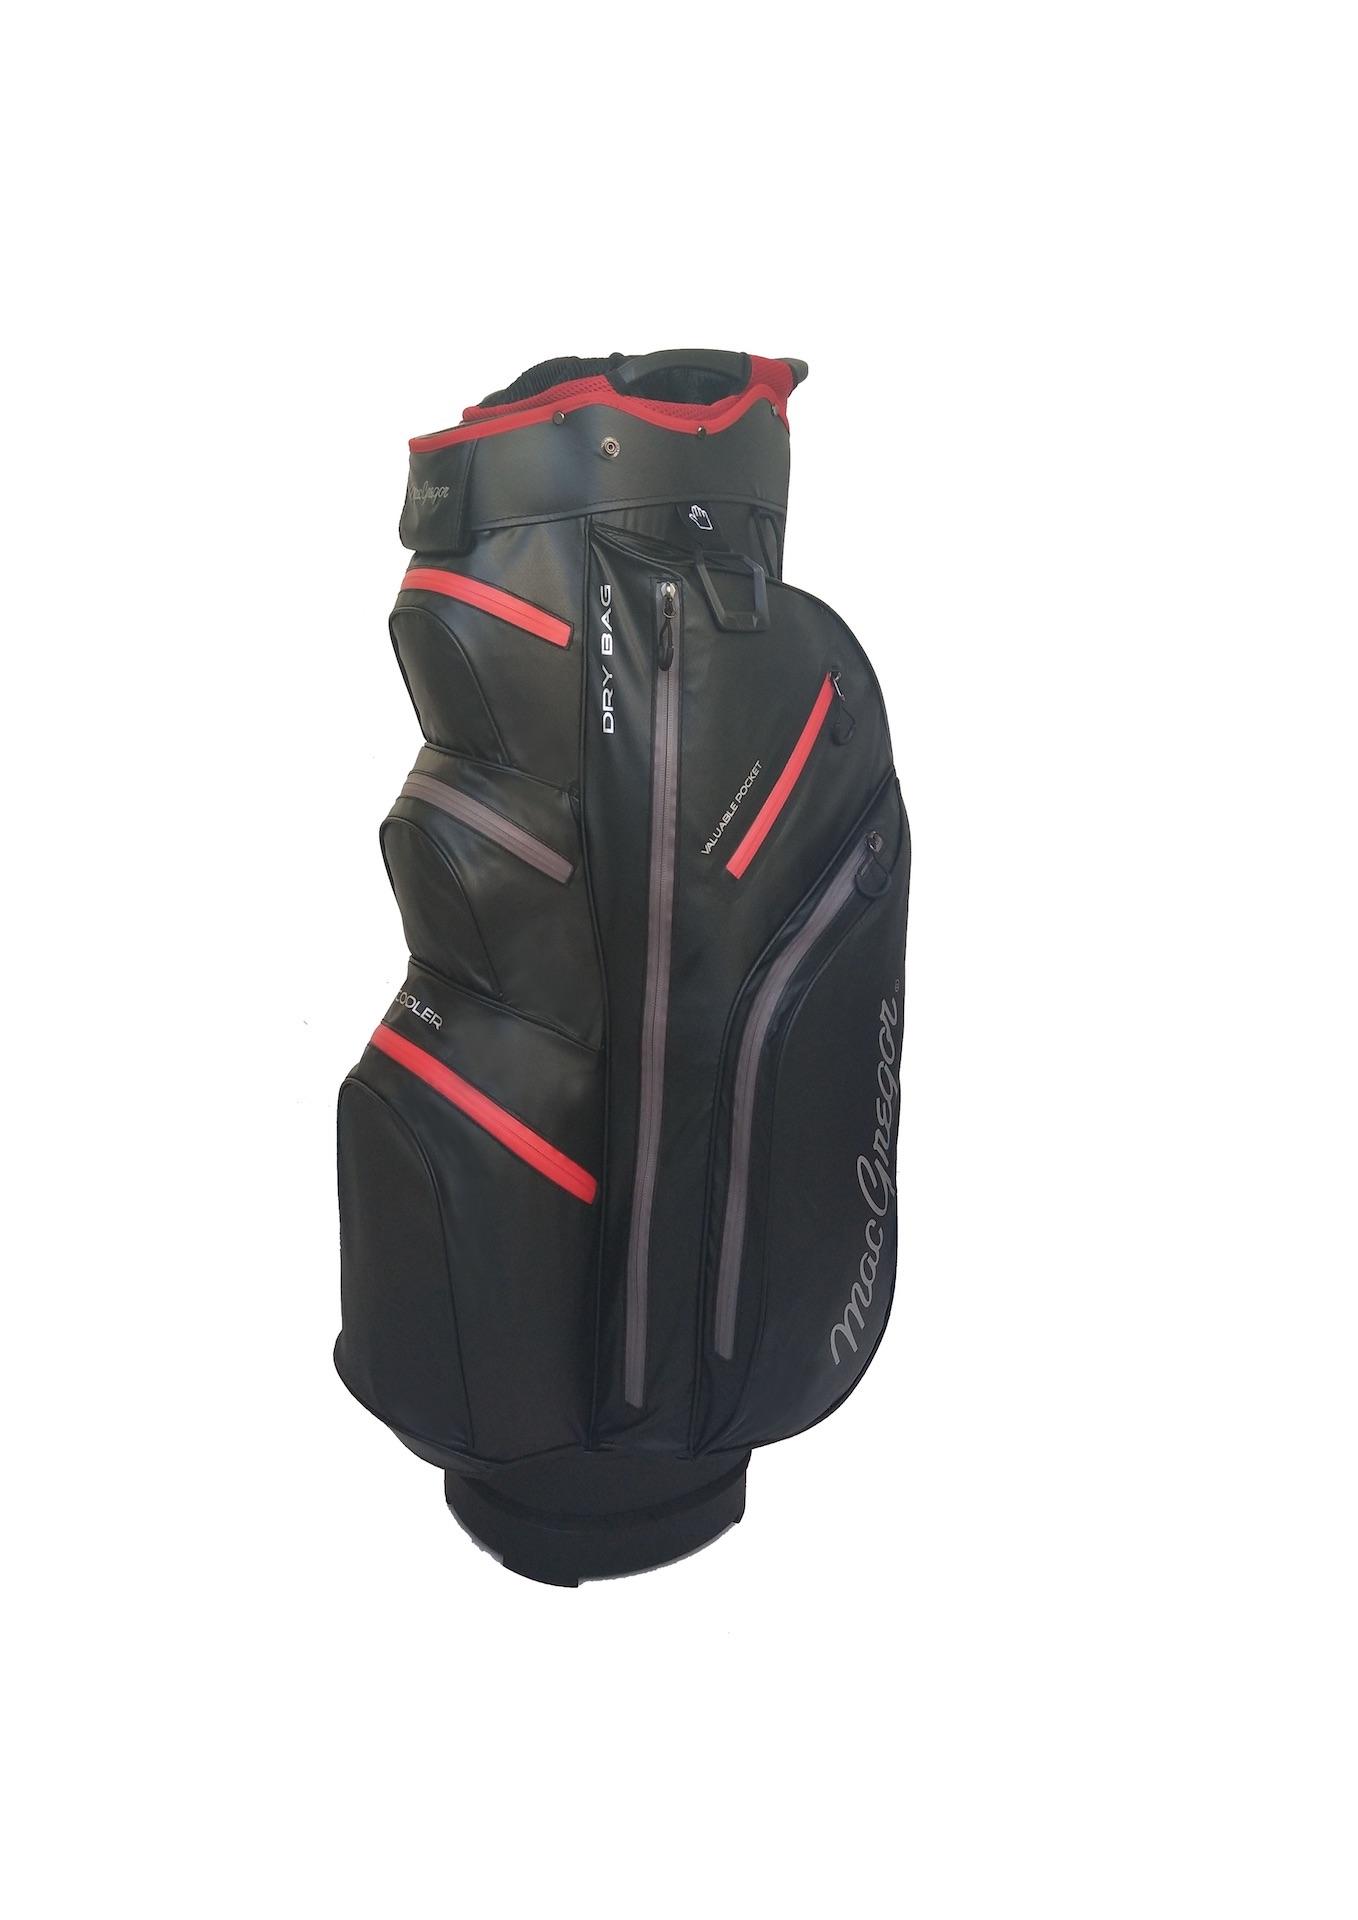 MacGregor launches MACTEC water repellent golf bags